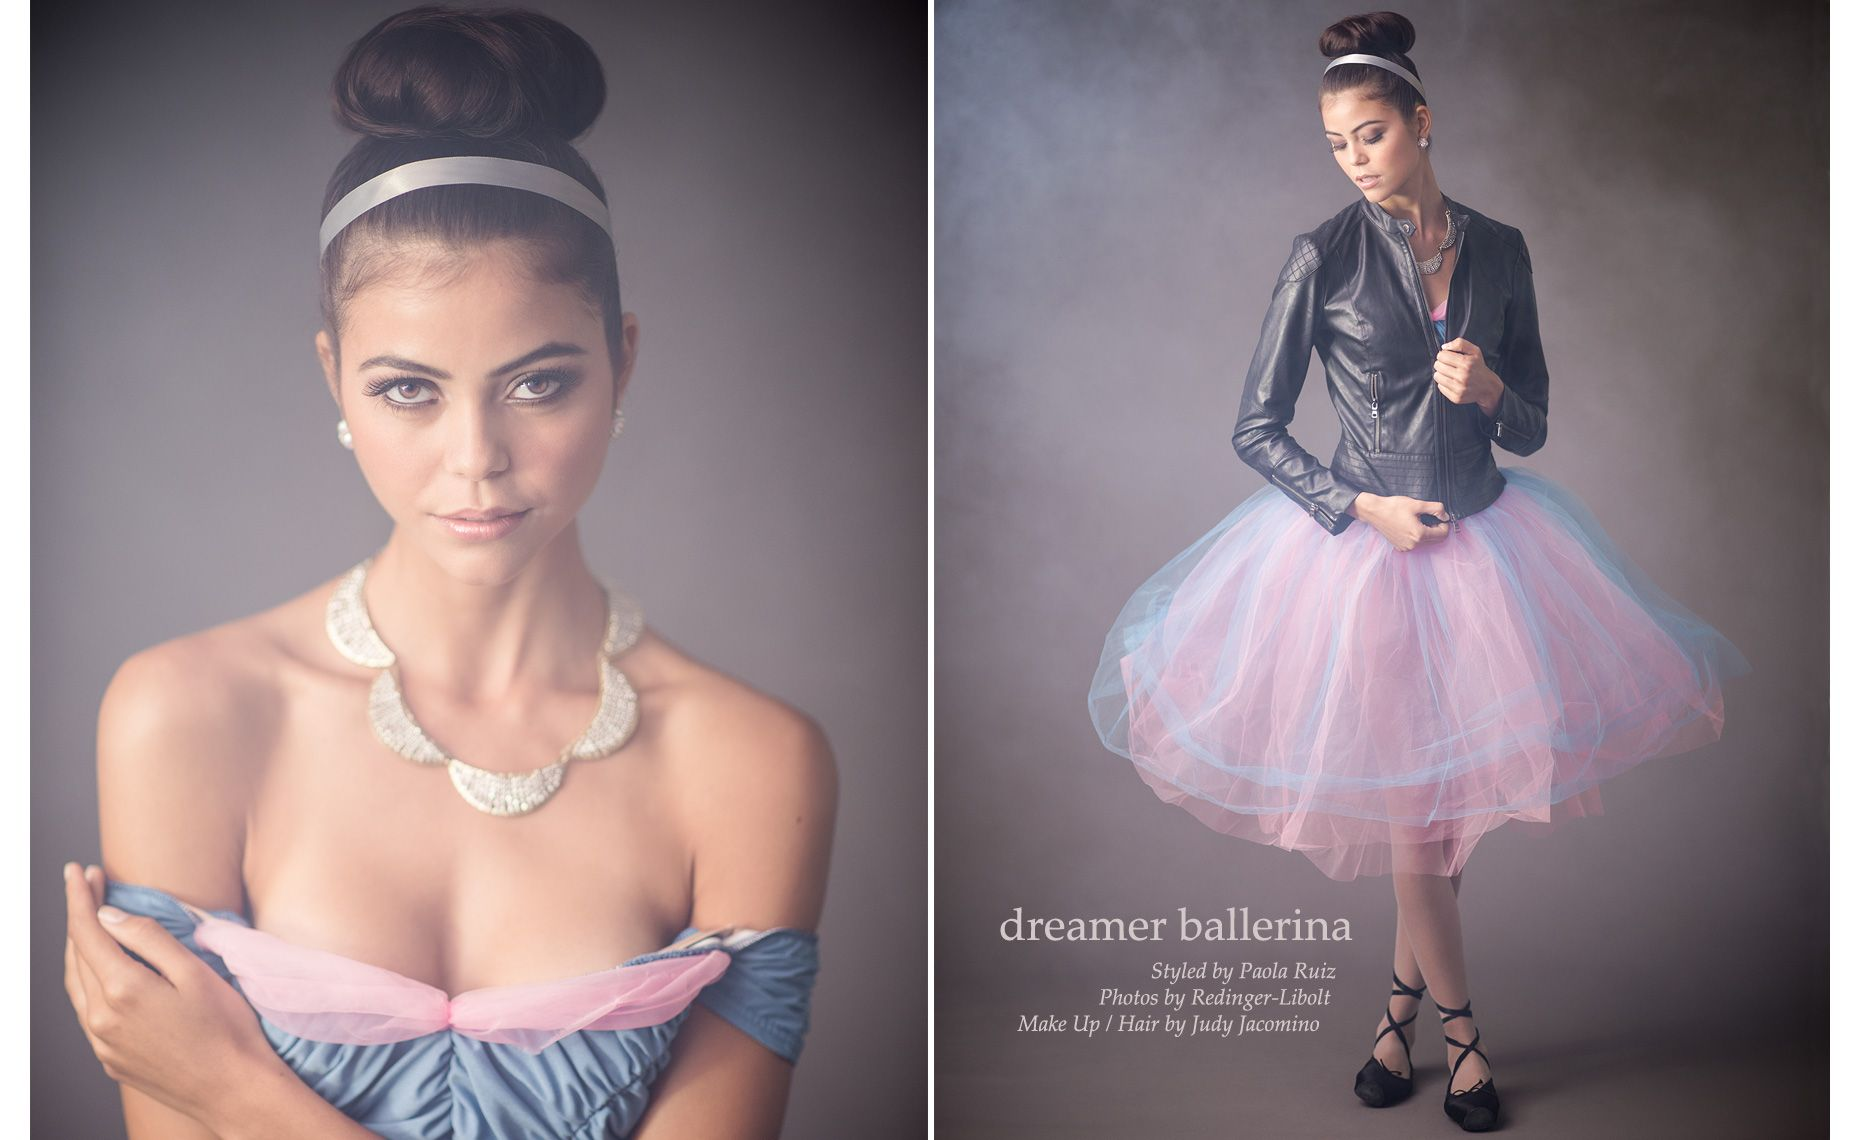 Scott Redinger Libolt Redphoto Fashion Photographers In